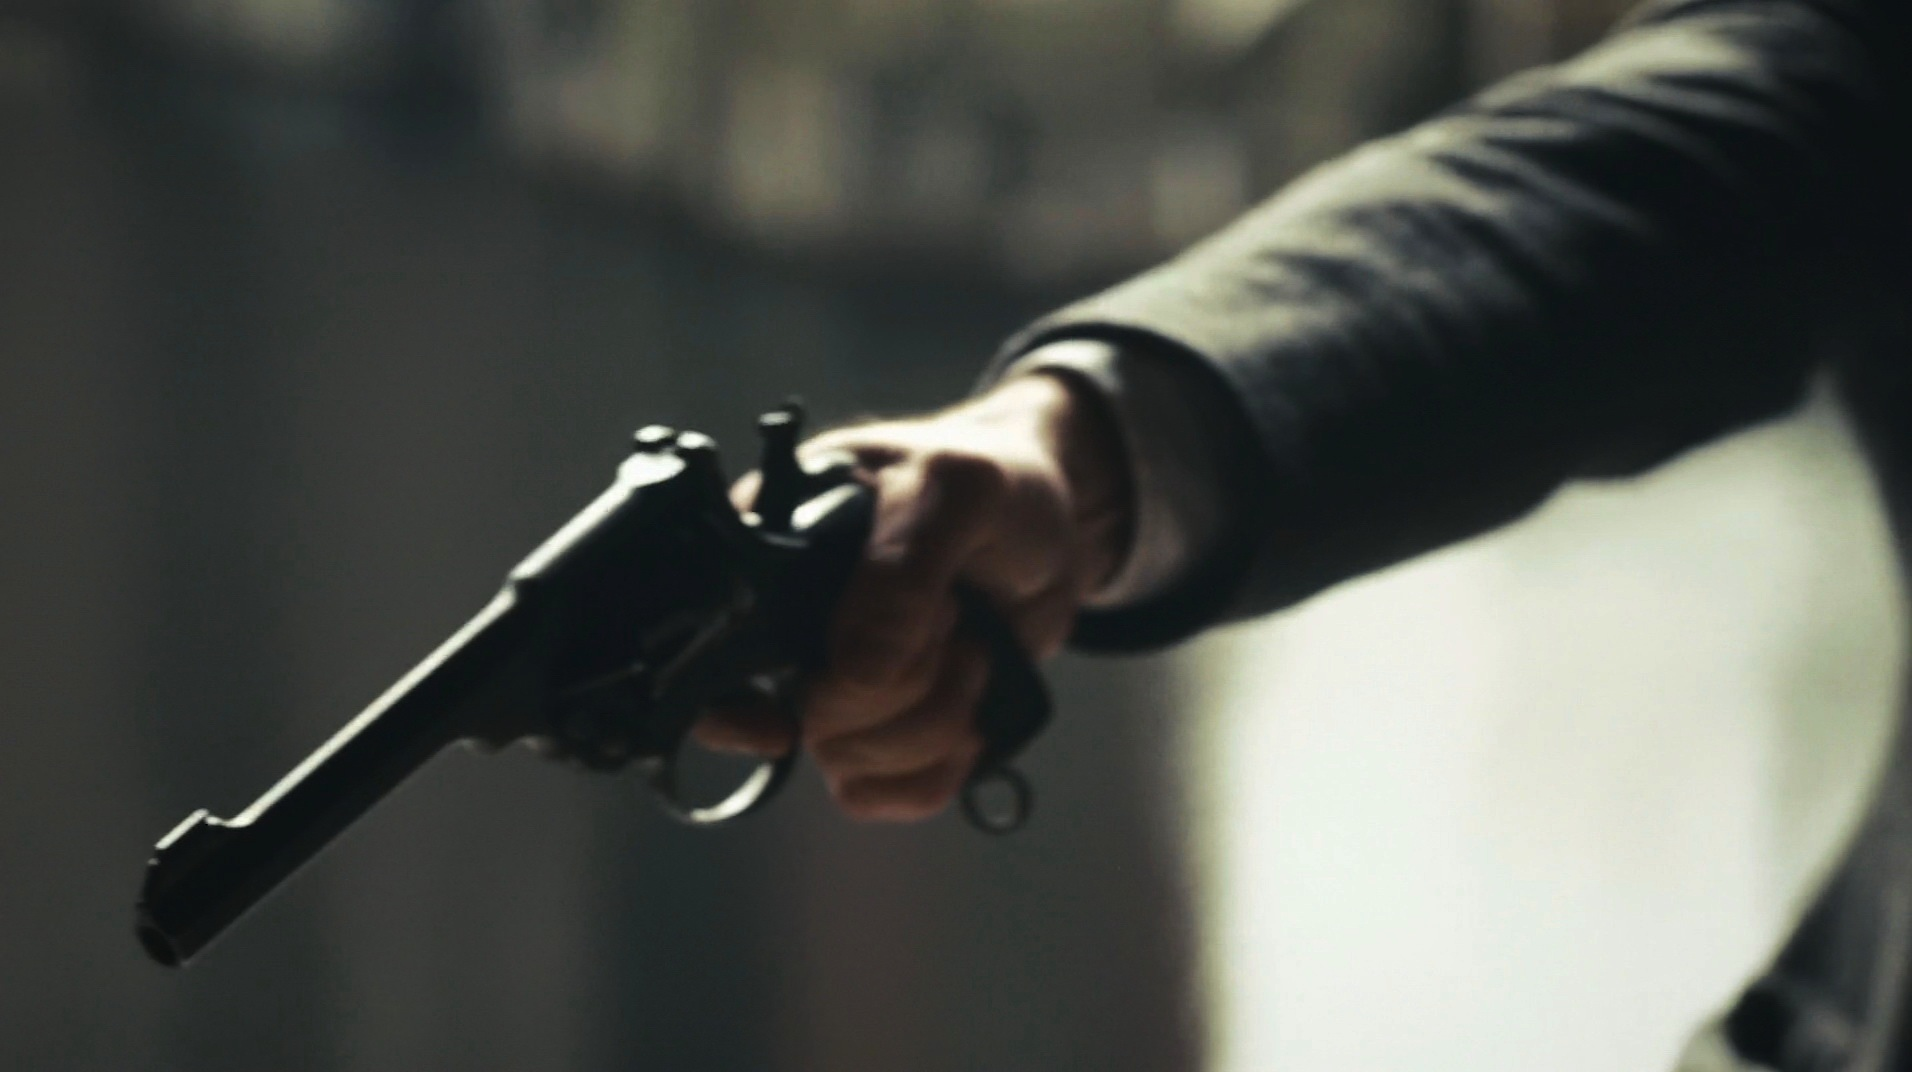 SHOTGUN T SHIRT BIRMINGHAM GANG SHELBY PEAKY BLINDERS OFFICIAL LICENSED